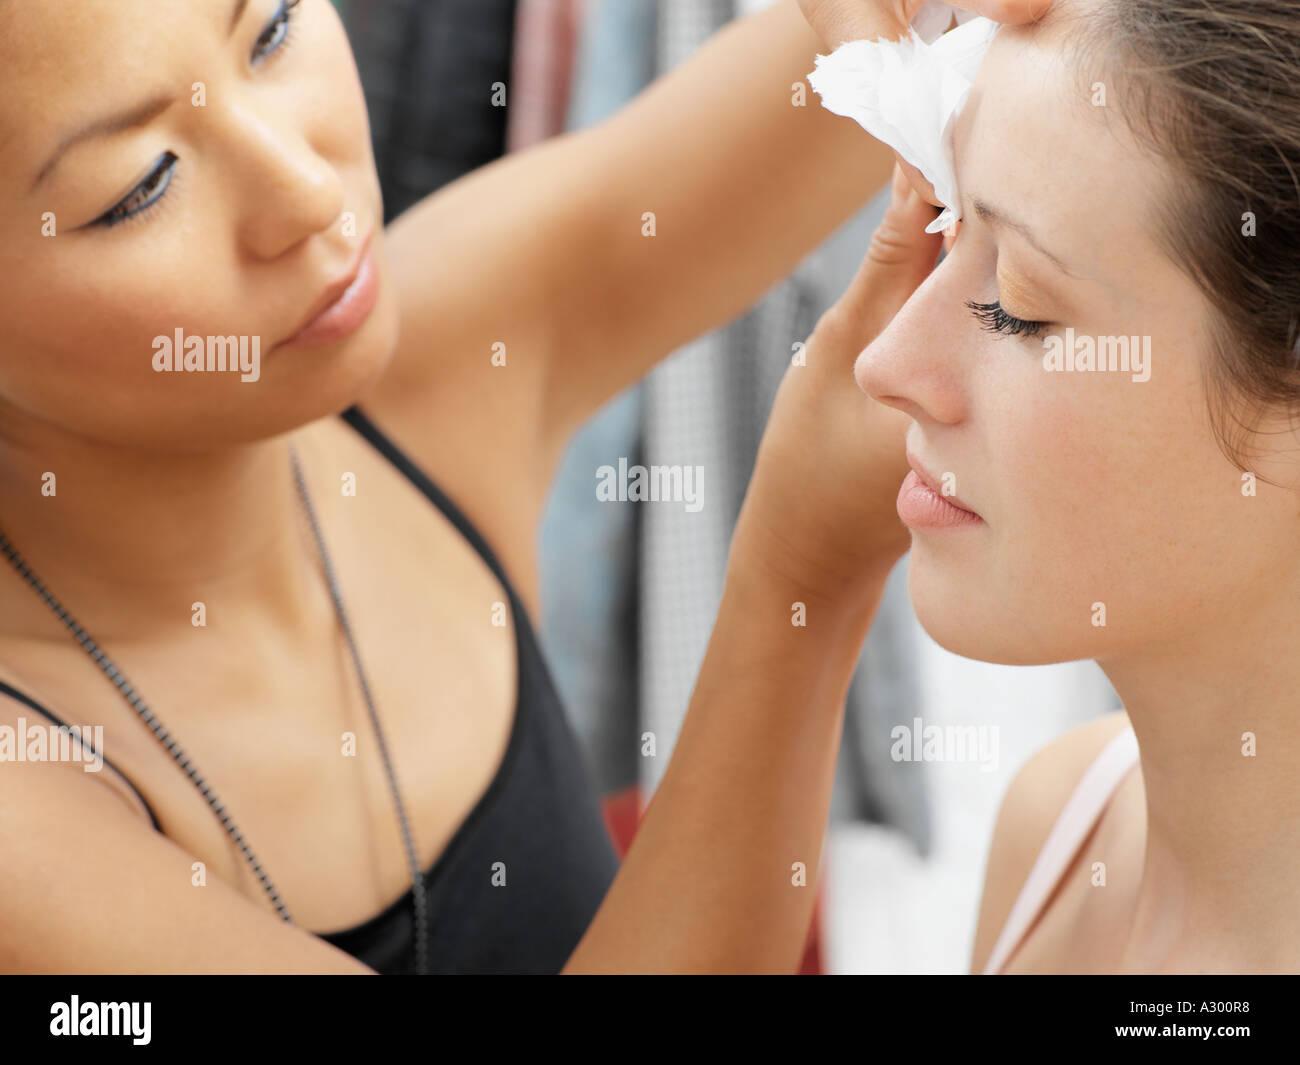 Model having her make-up done - Stock Image